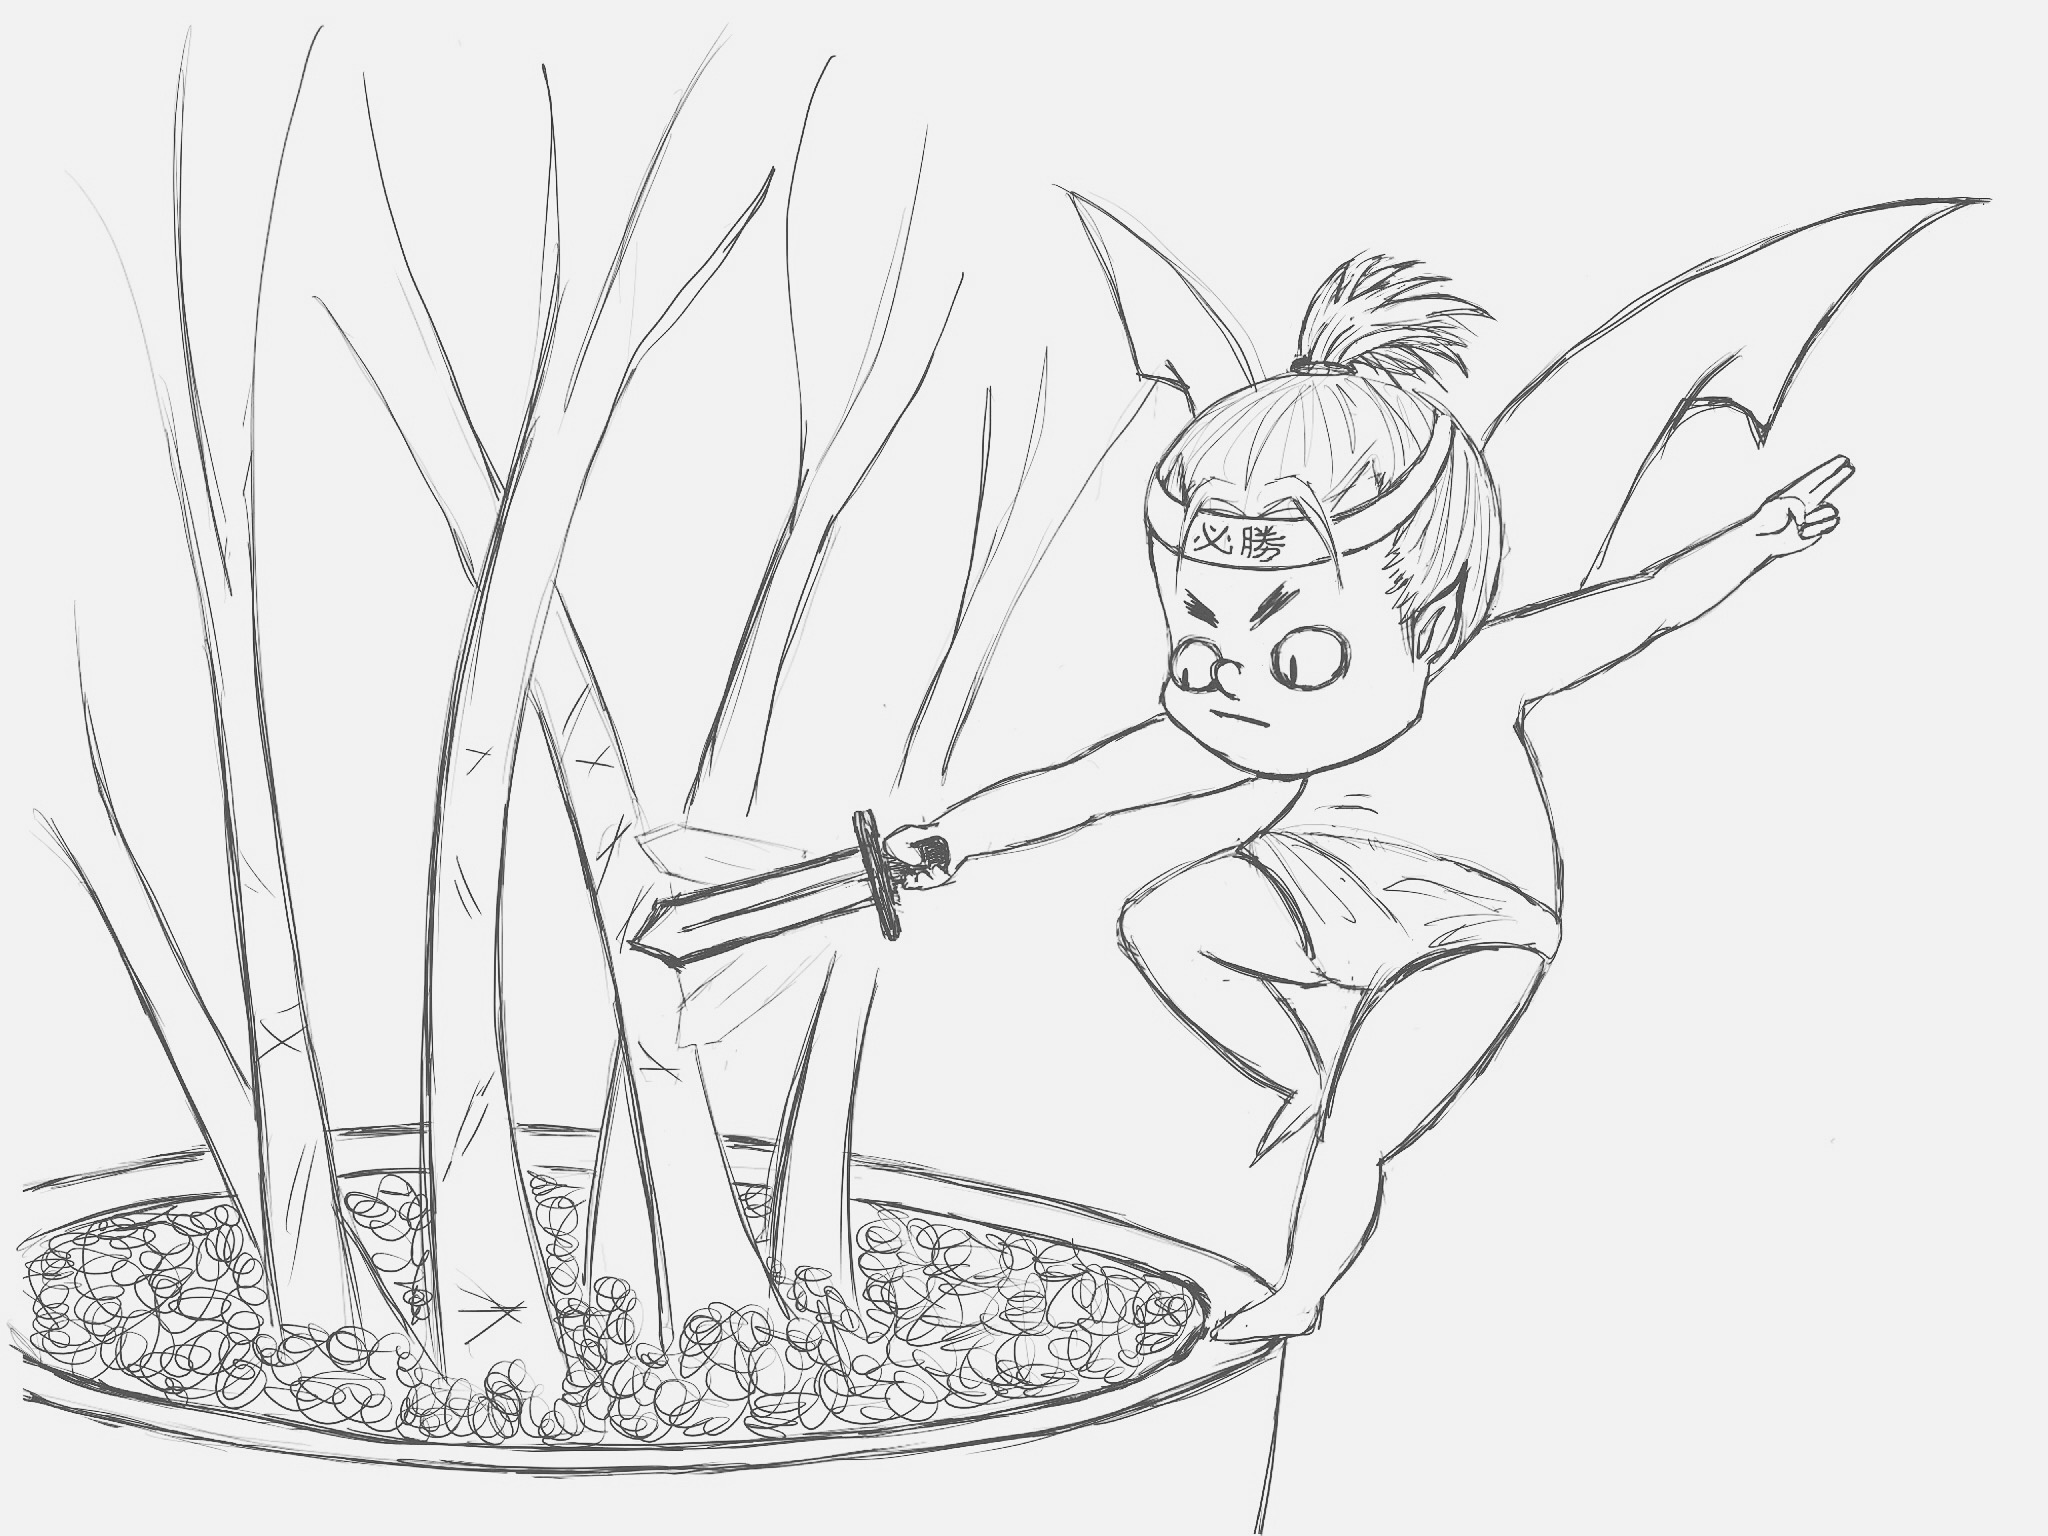 005 - Plant Killer